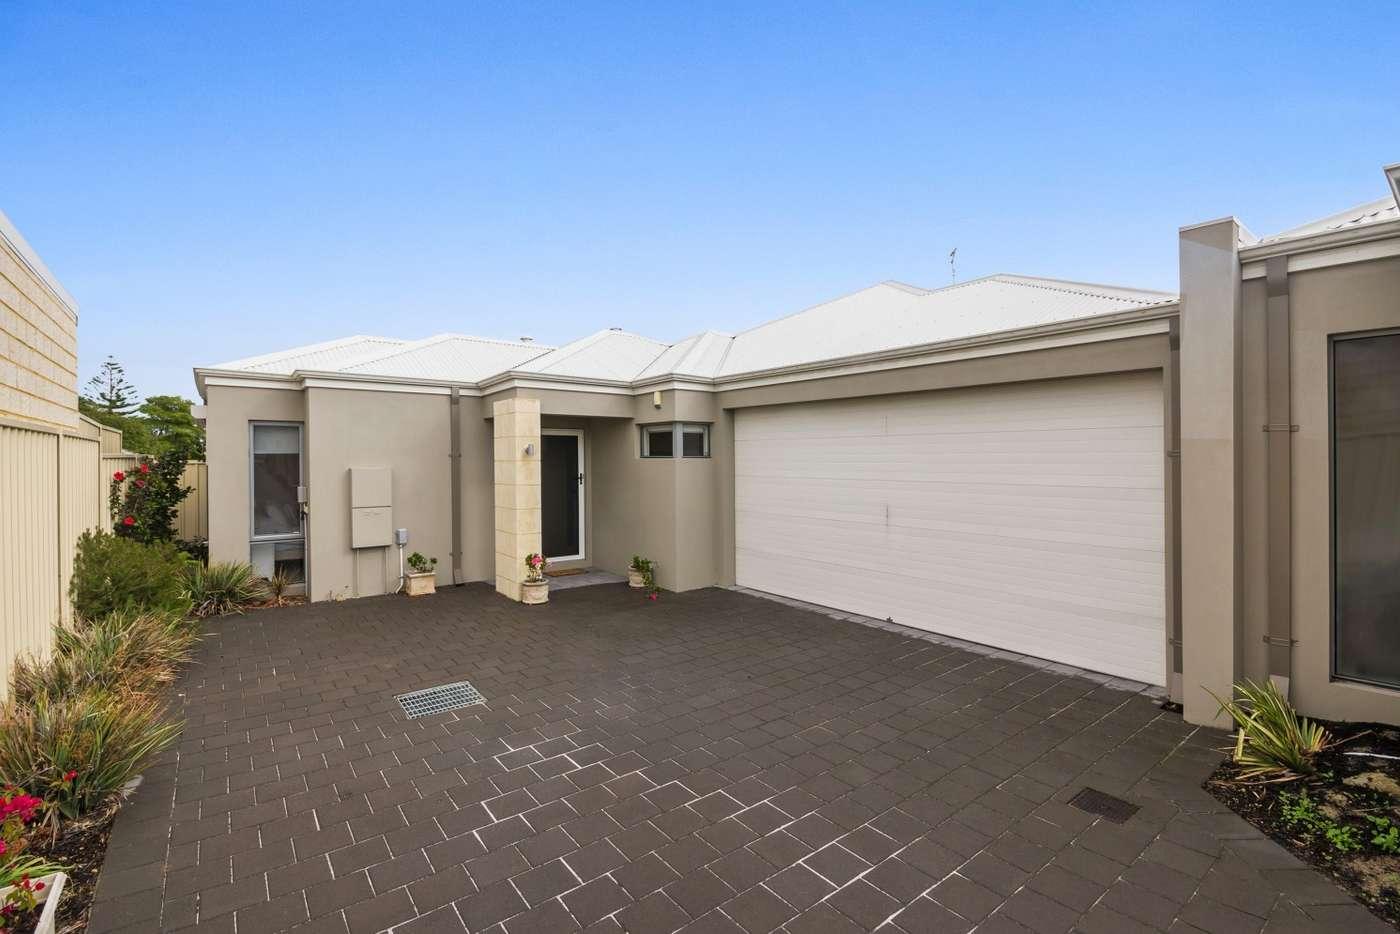 Main view of Homely house listing, 49C Hillsborough Drive, Nollamara WA 6061